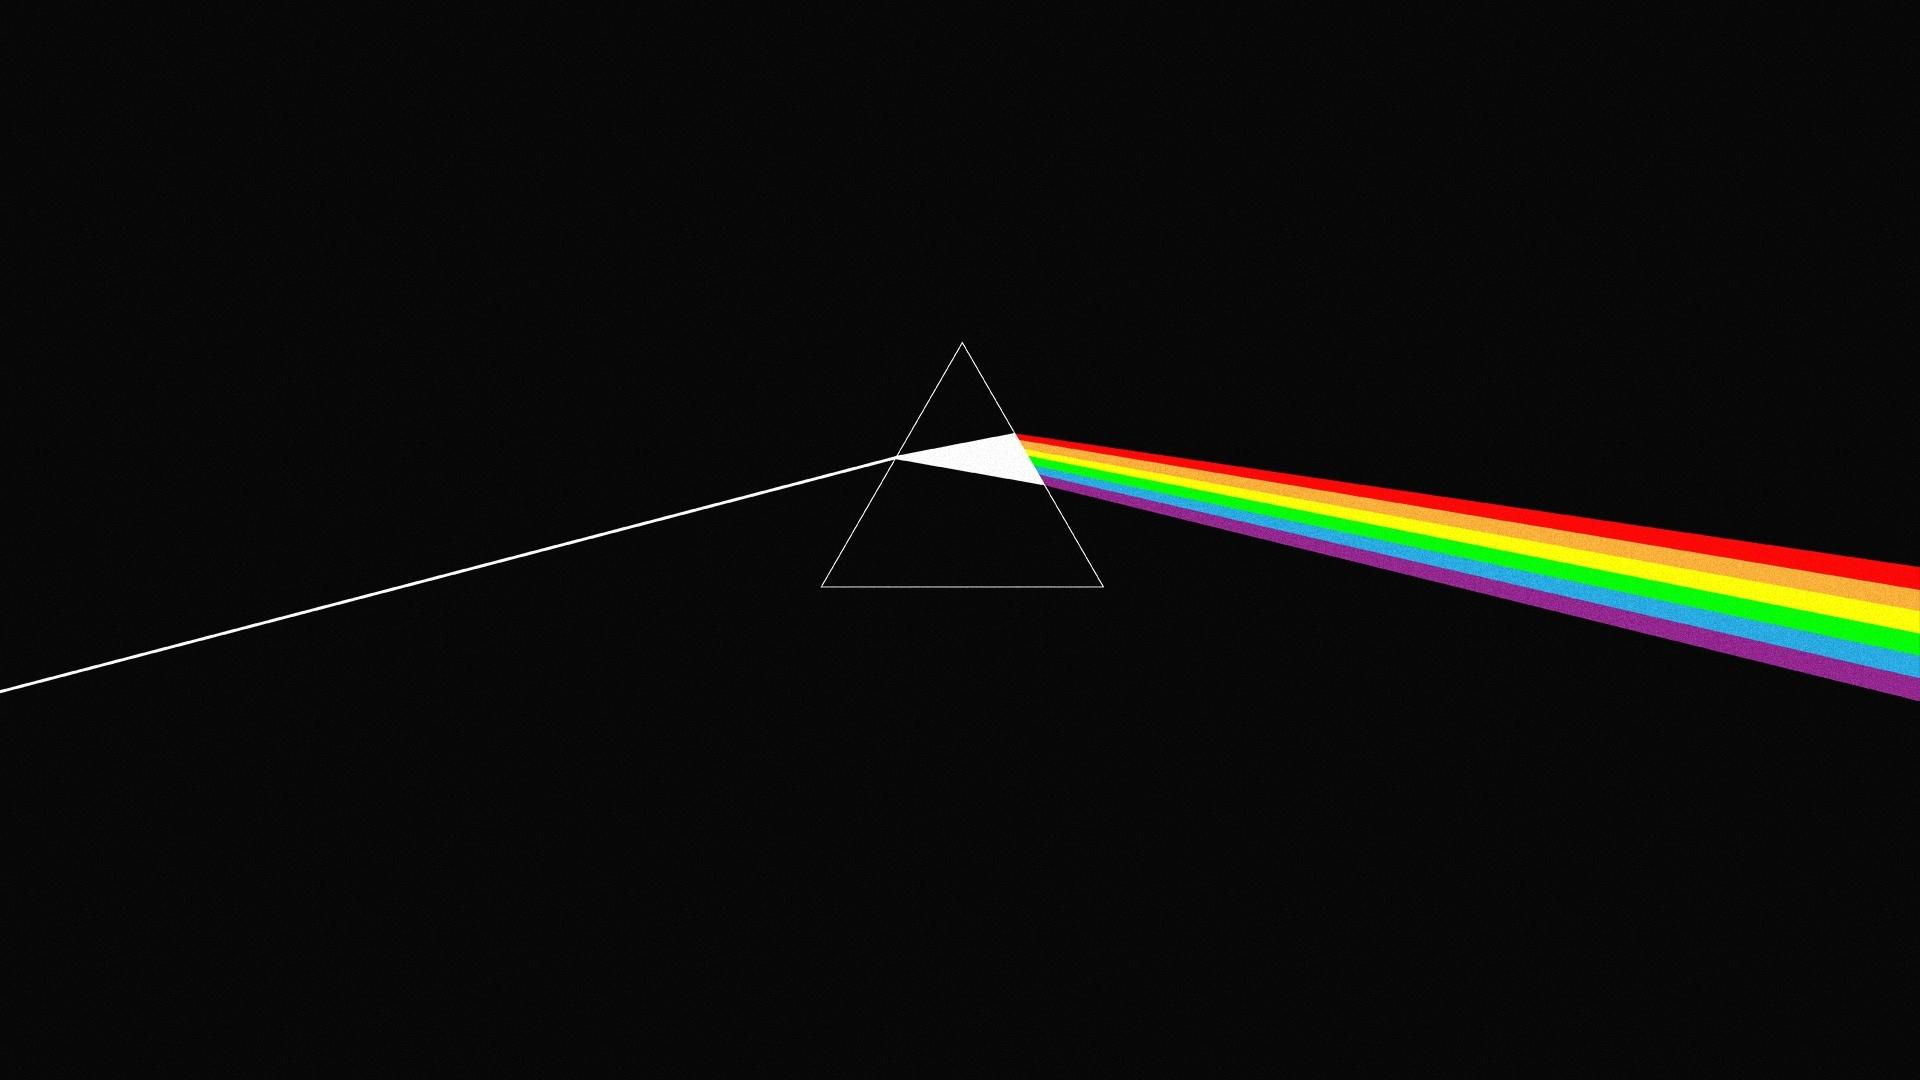 Pink Floyd Wallpaper Hd WallpaperPool 1920x1080